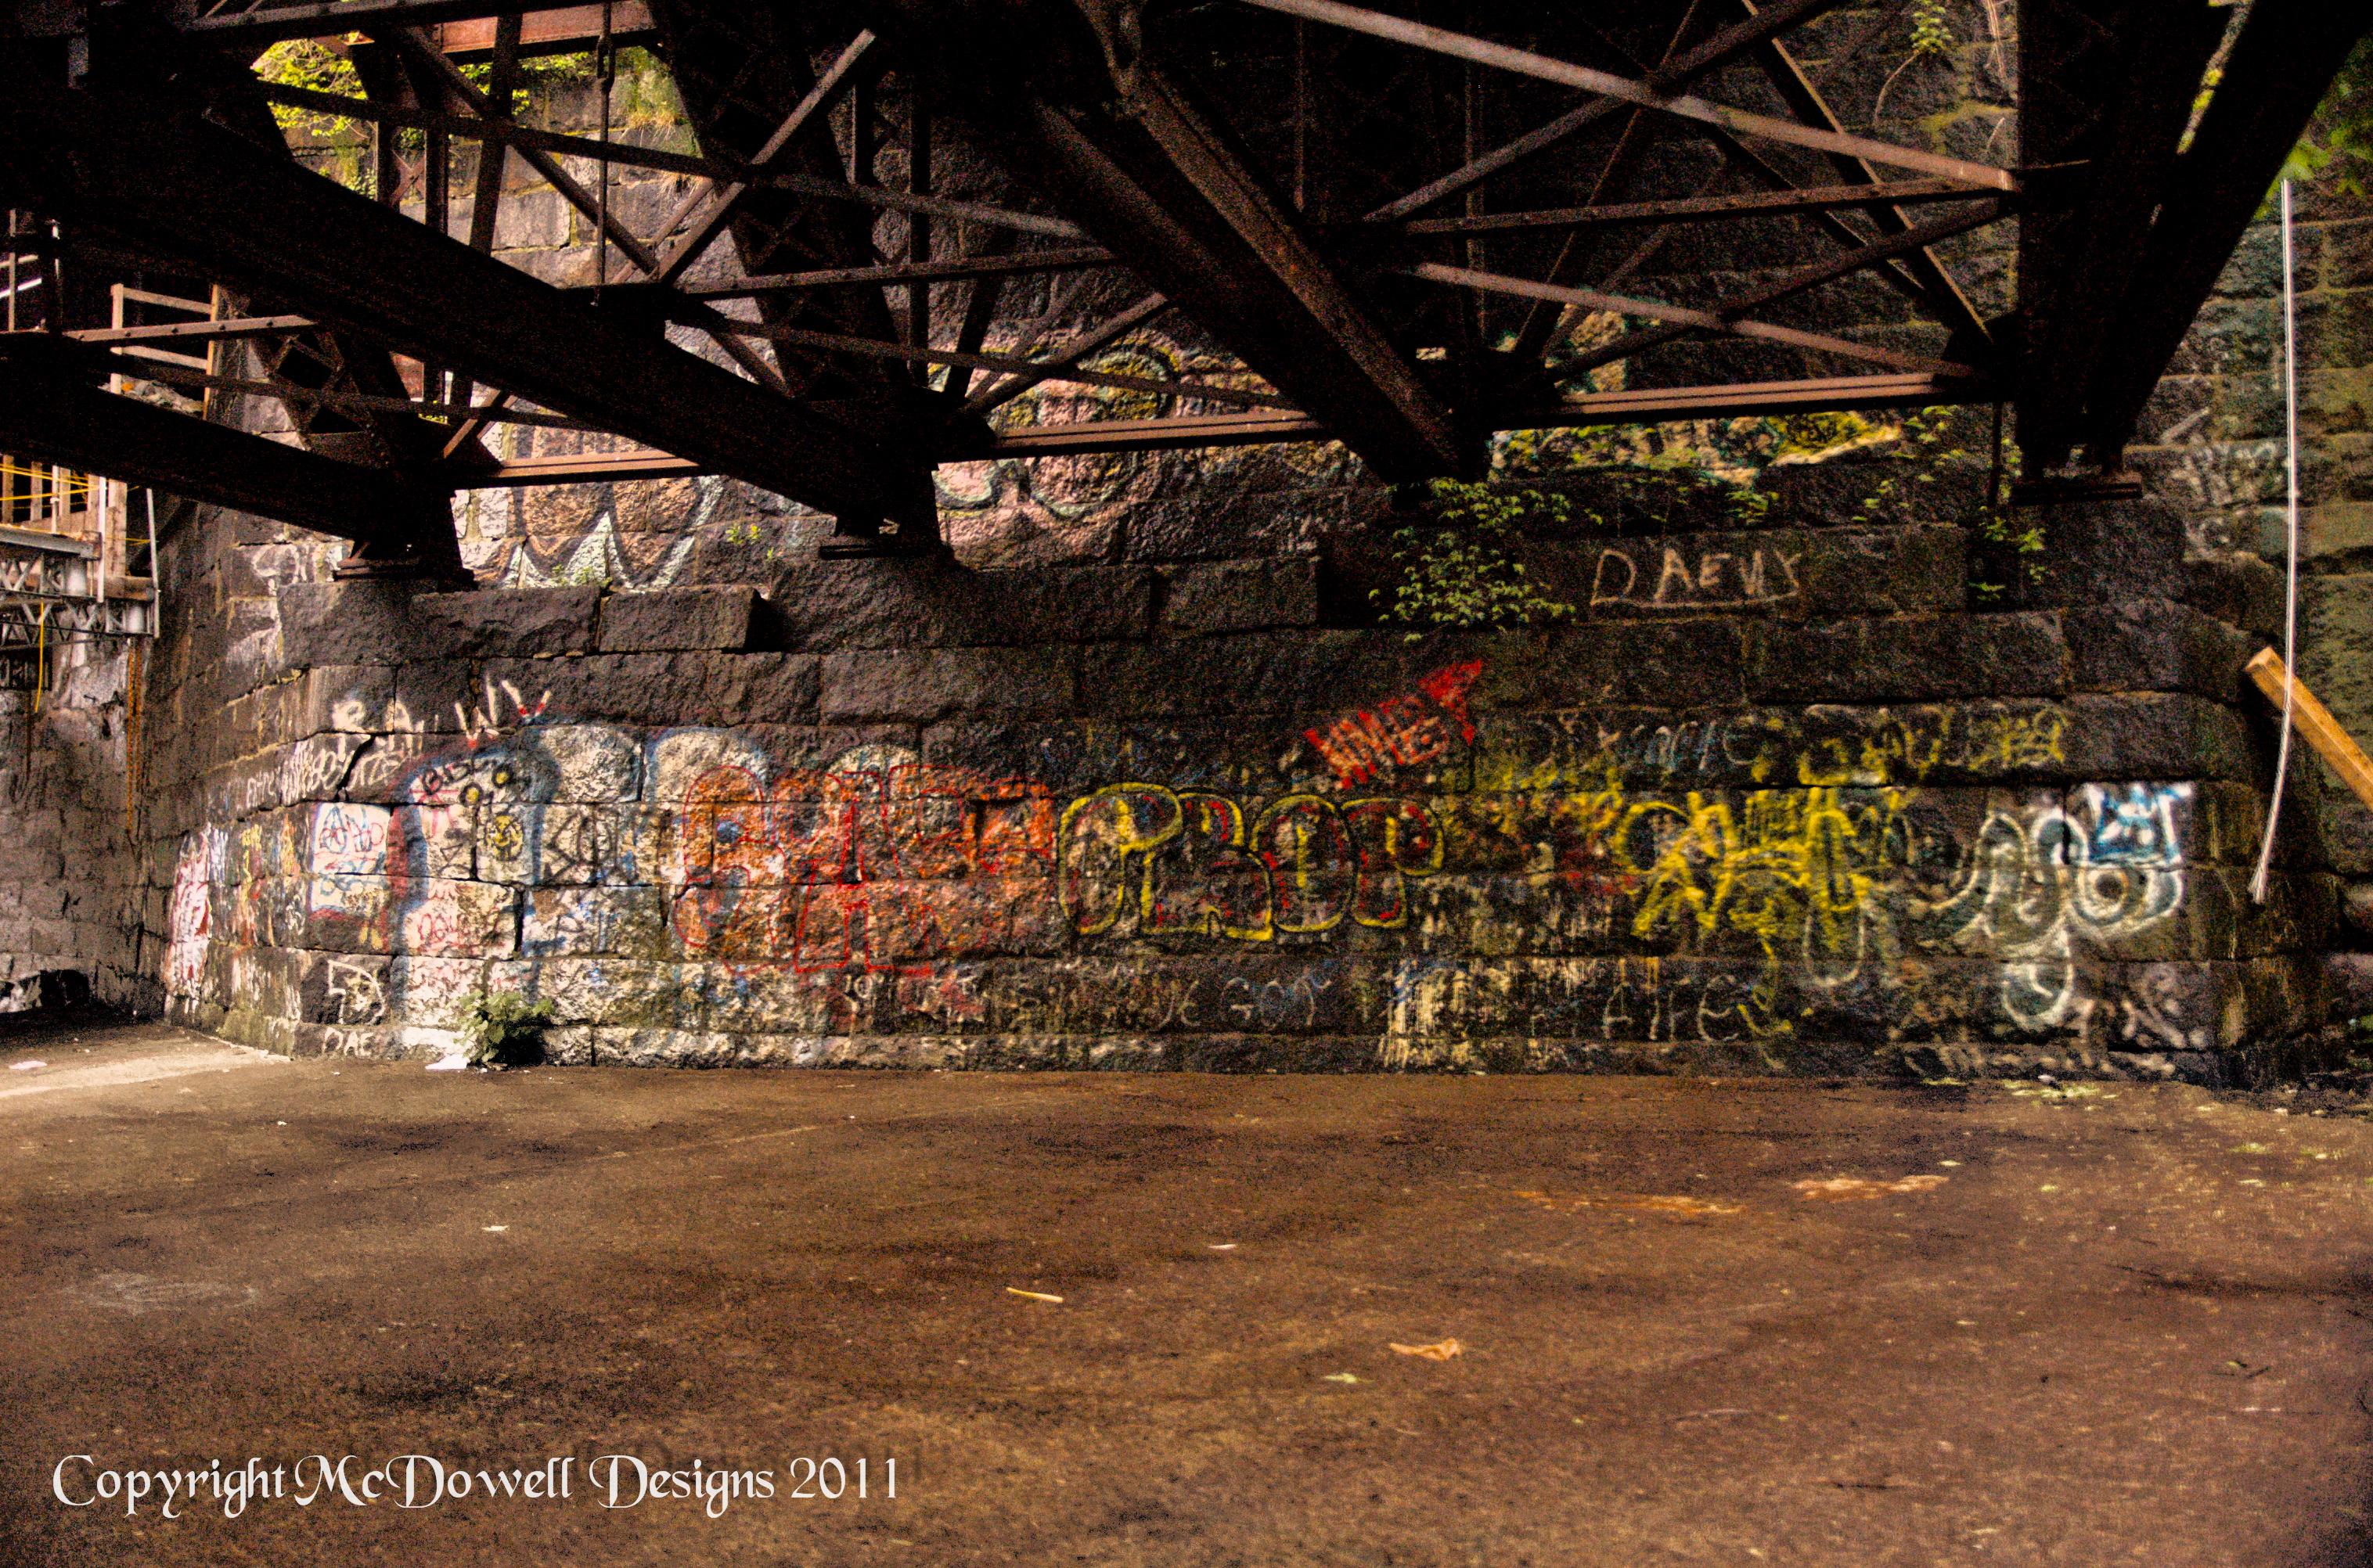 87. Under the Bridge   McDowell's Journey 365 Days of 2012